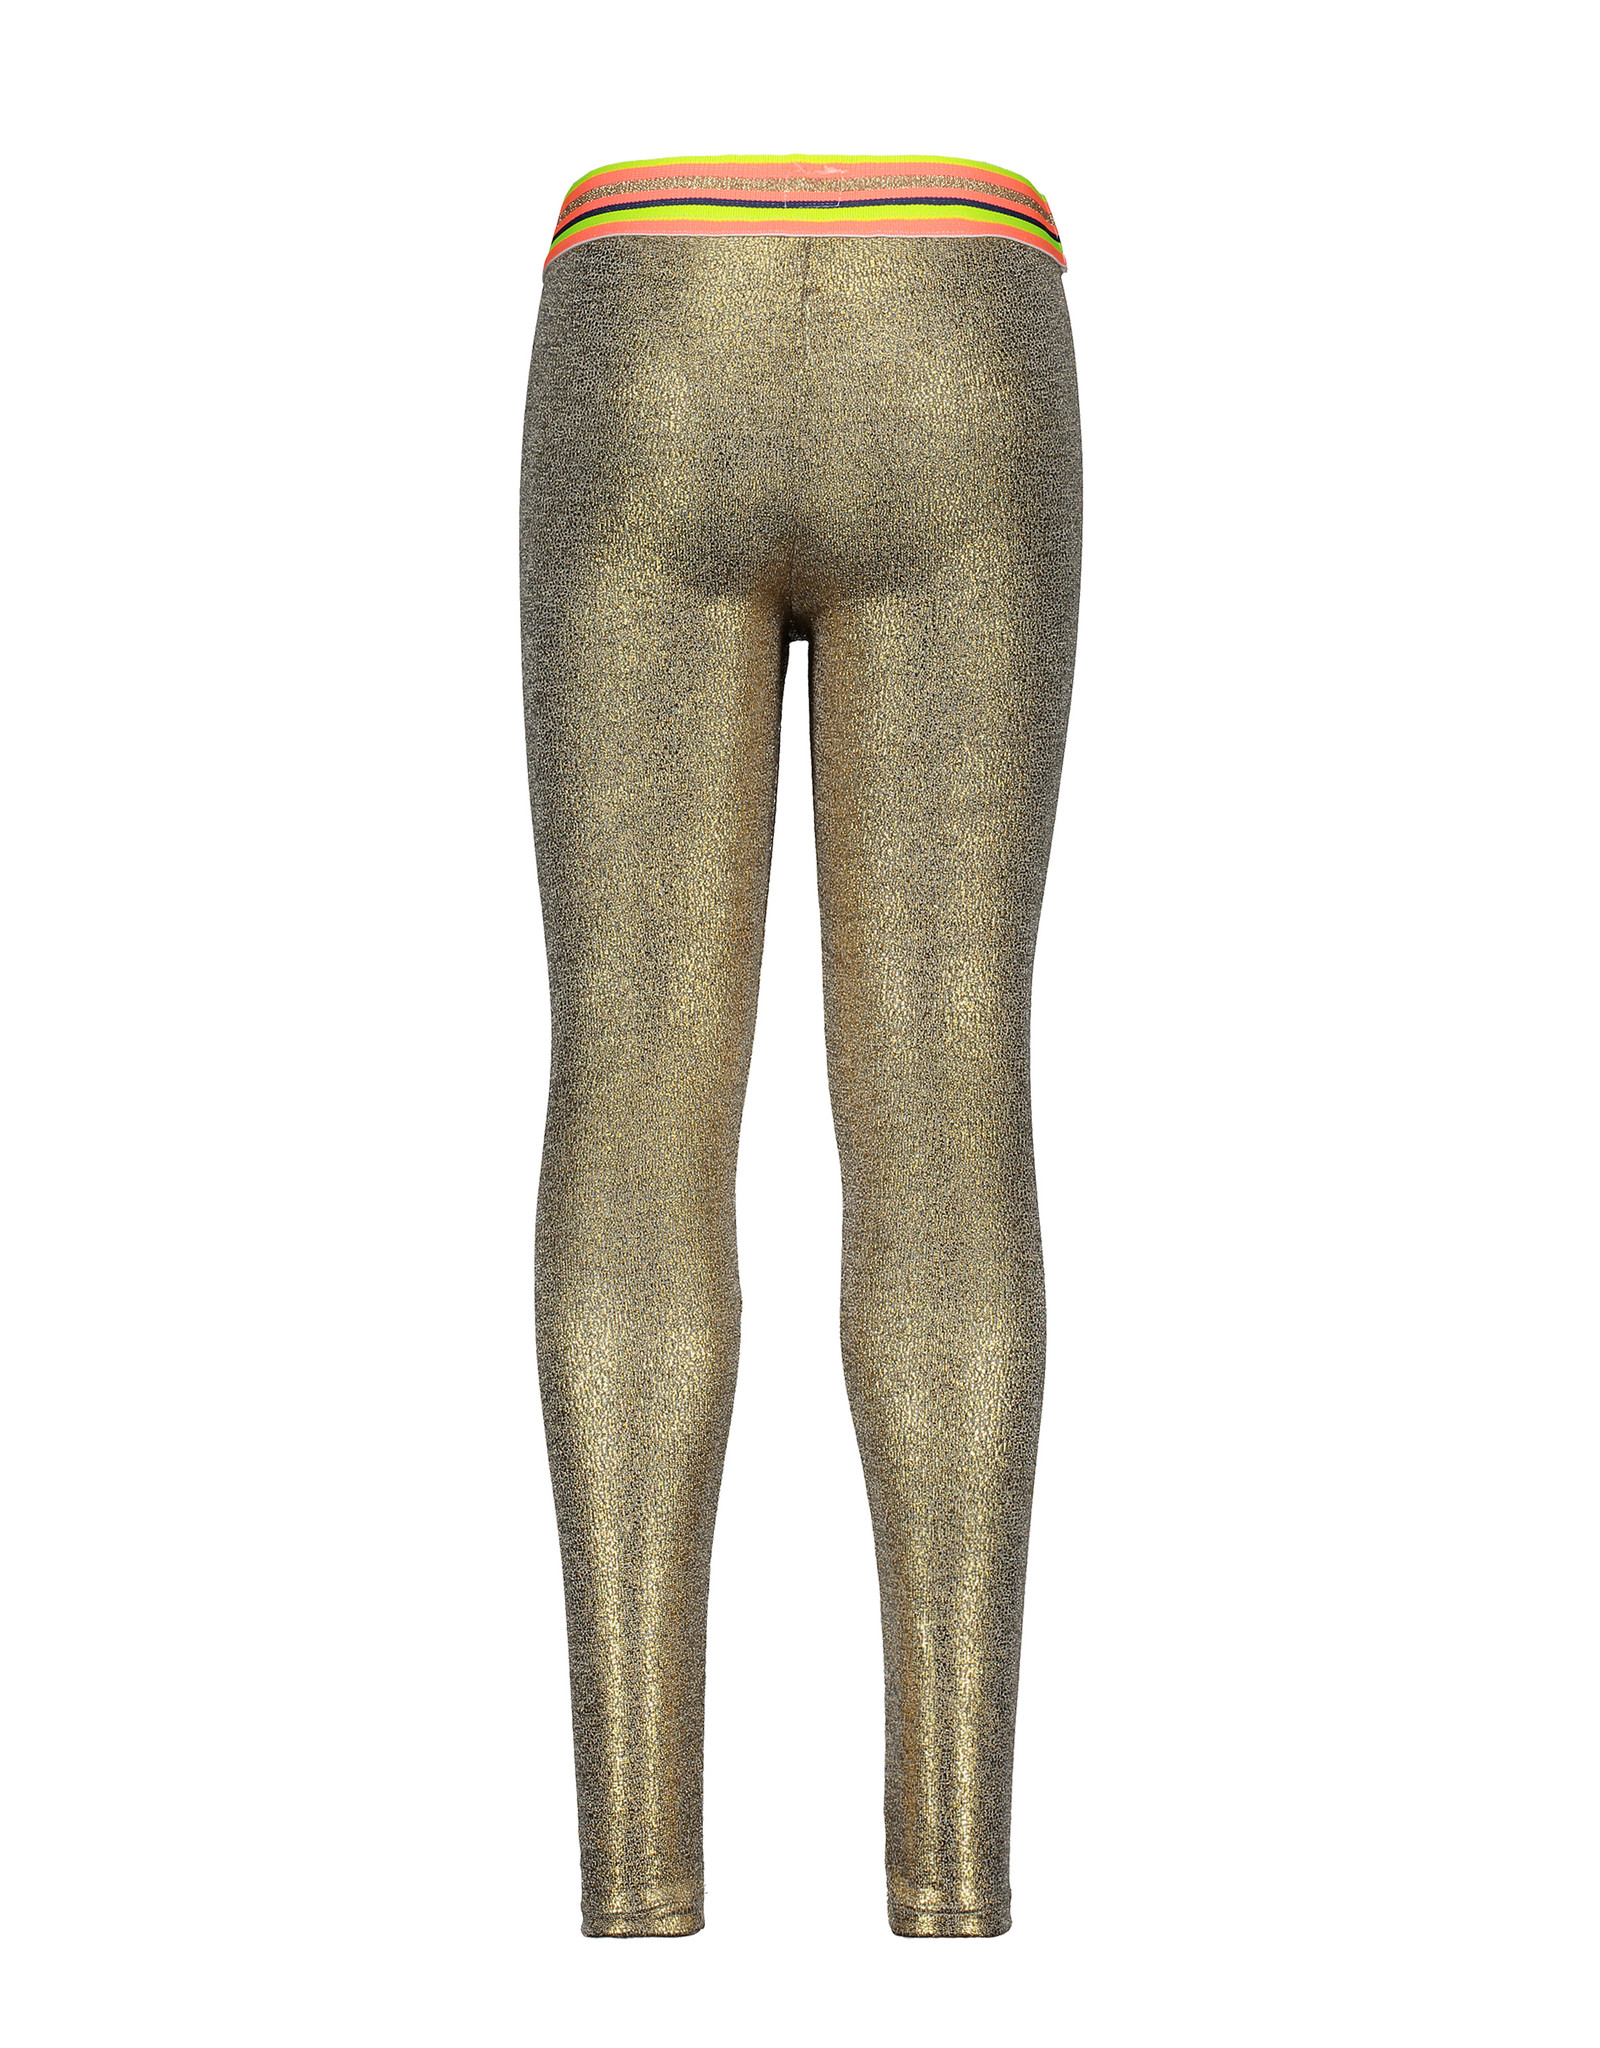 Kidz-Art Legging coated with fancy stripe elastic